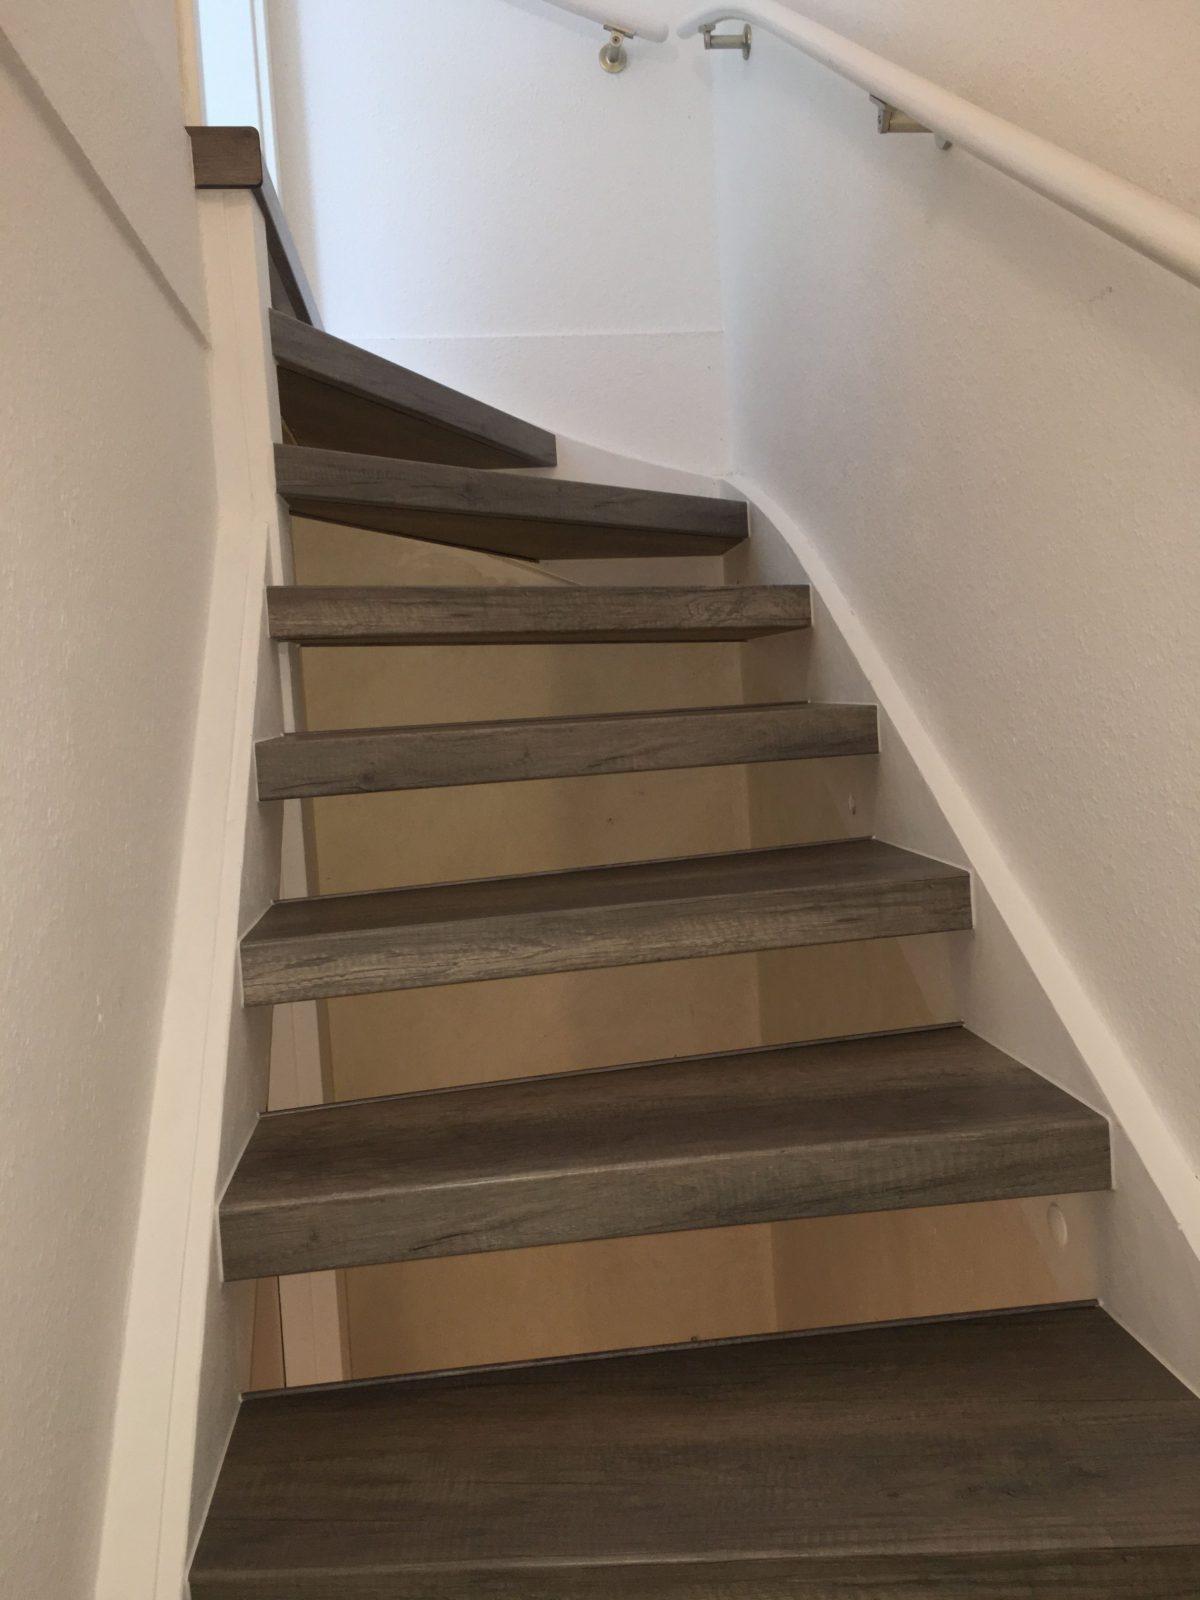 Offene Treppen Neu Gestalten  Alte Treppe Neu Gestalten In 2019 von Alte Treppen Neu Gestalten Bild